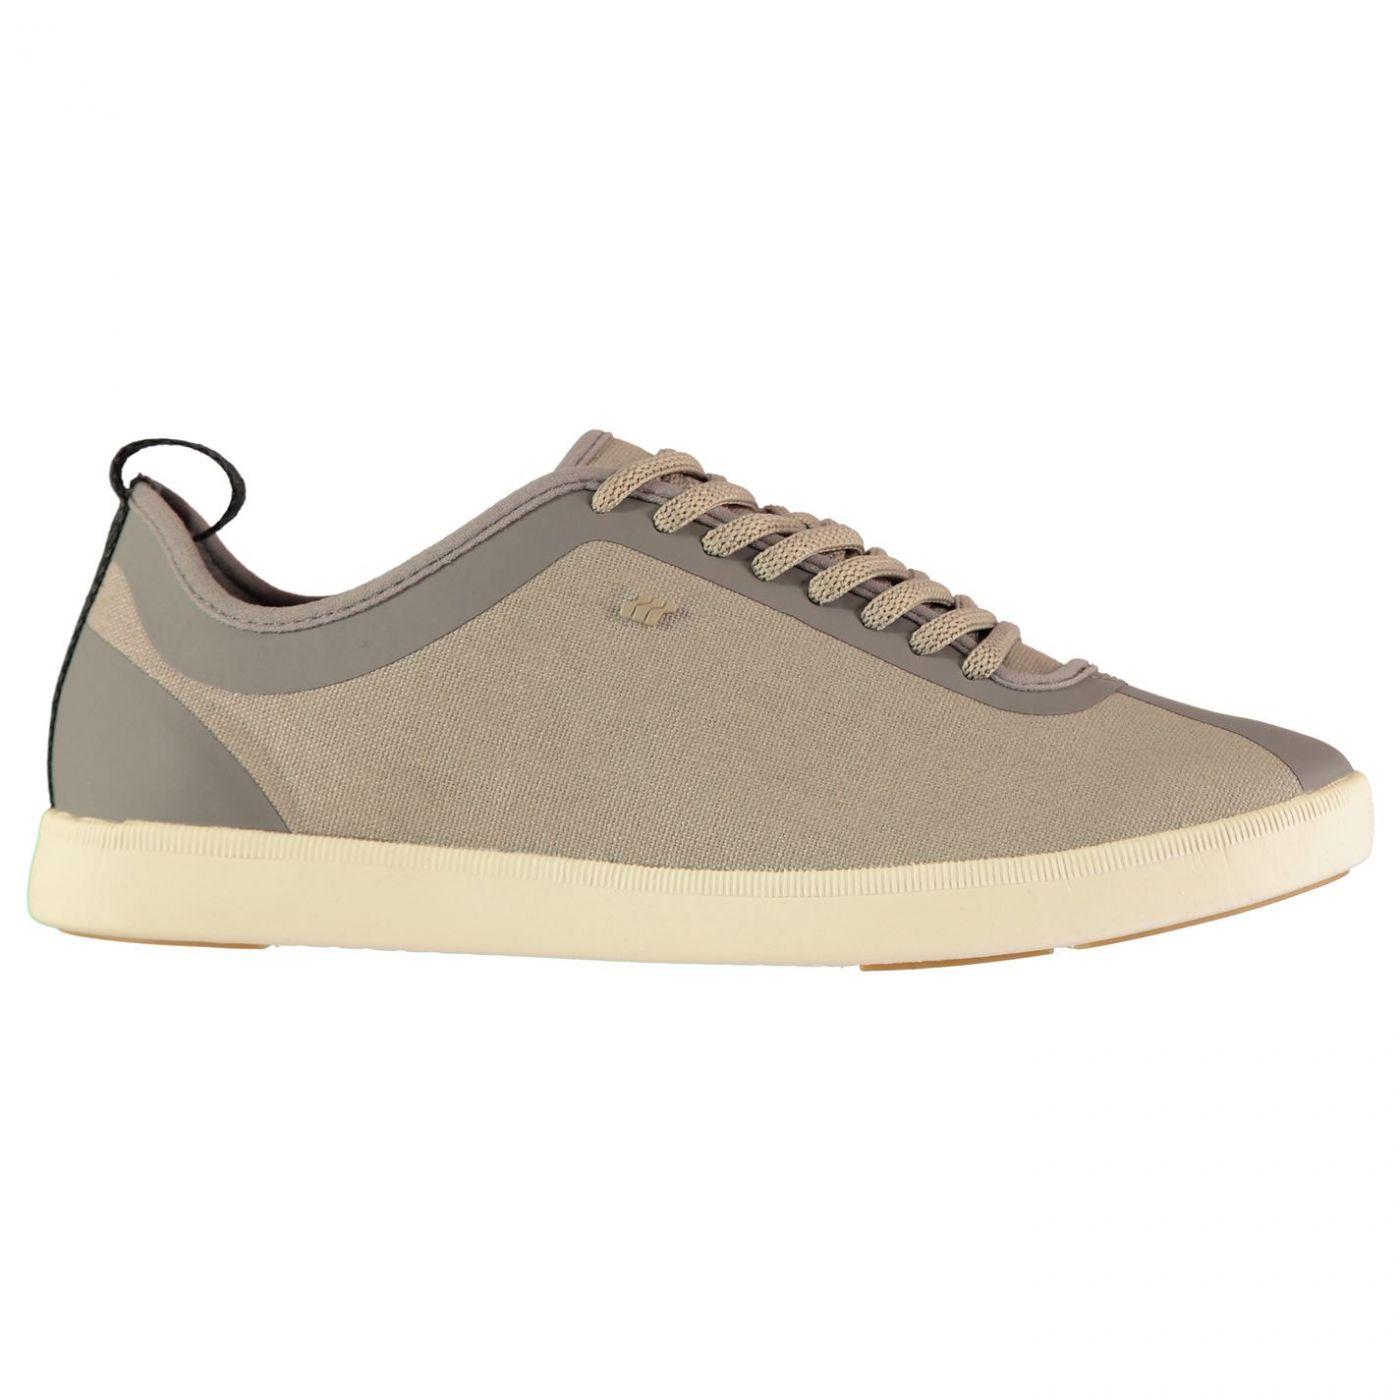 Men's shoes Boxfresh Wieland